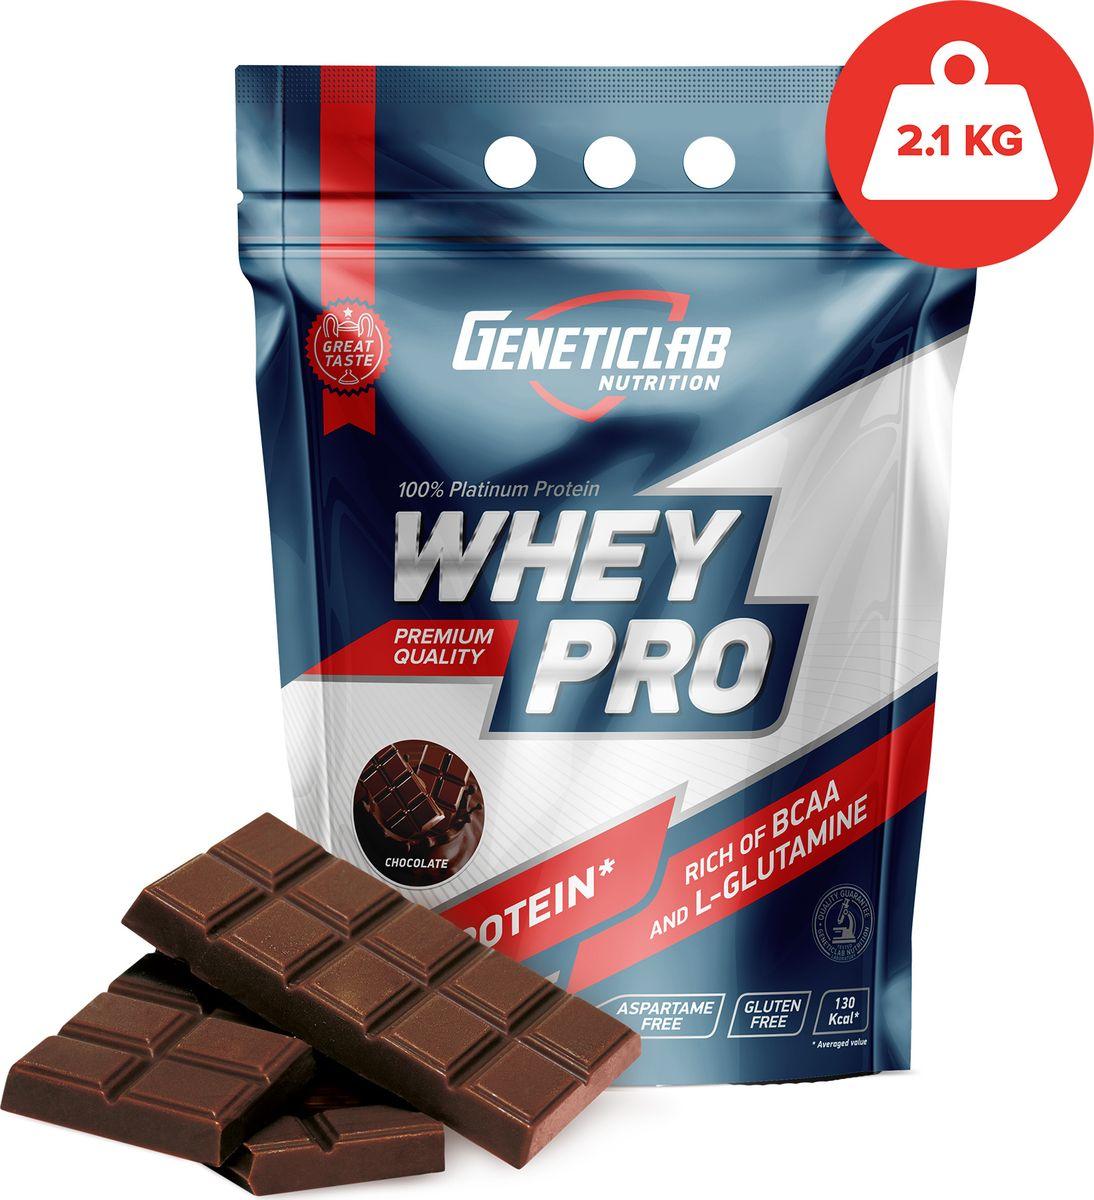 Протеин сывороточный Geneticlab Nutrition Whey Pro, шоколад, 2,1 кг сывороточный протеин bbb whey classic шоколад 70% белка и bcaa 1 кг